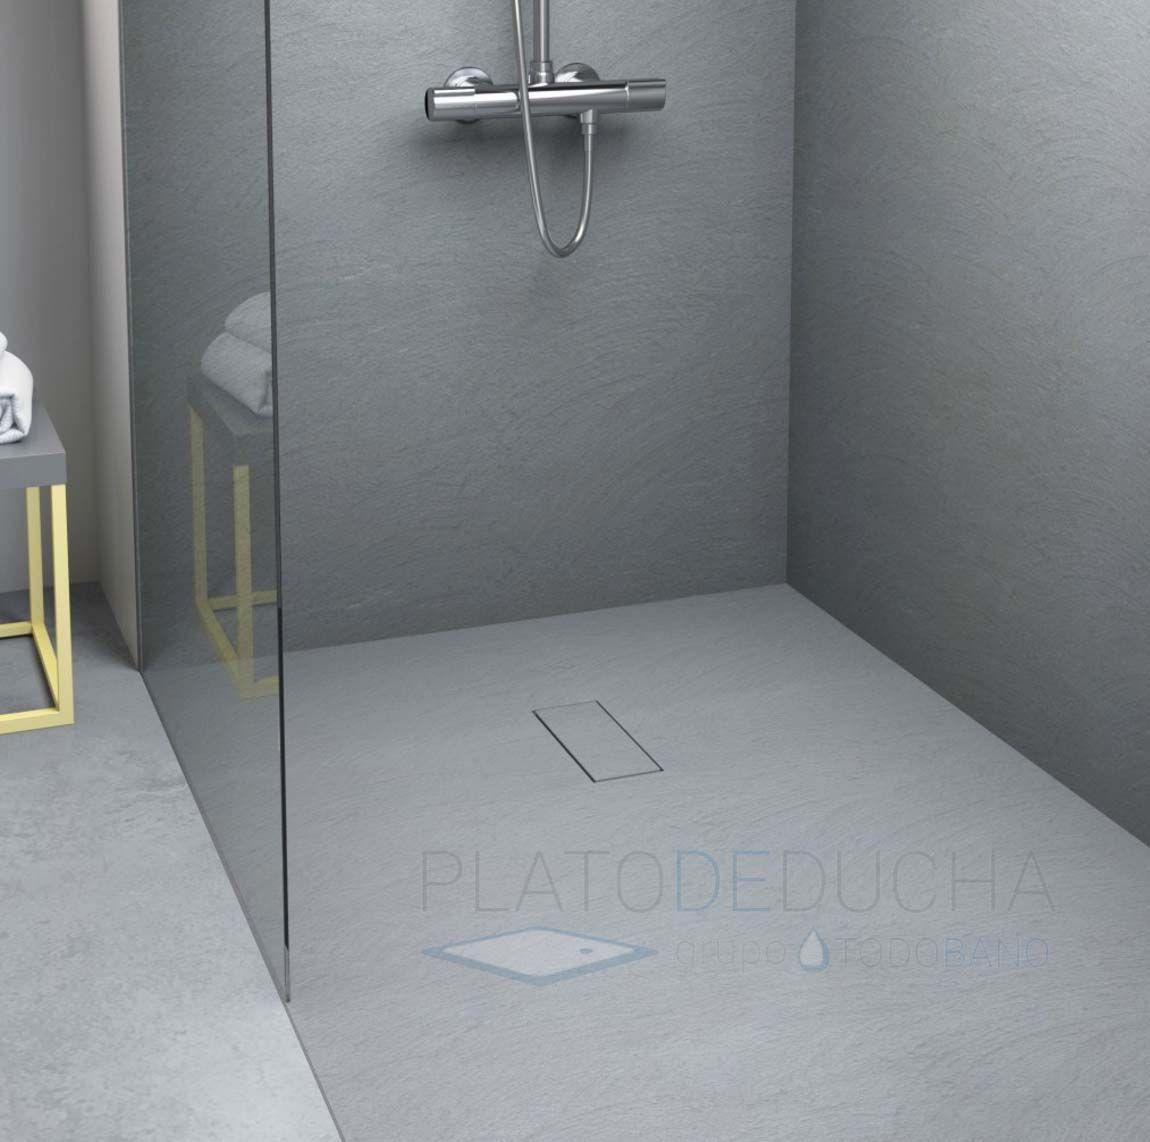 Plato De Ducha De Resina Cement Con Una Original Textura Cemento